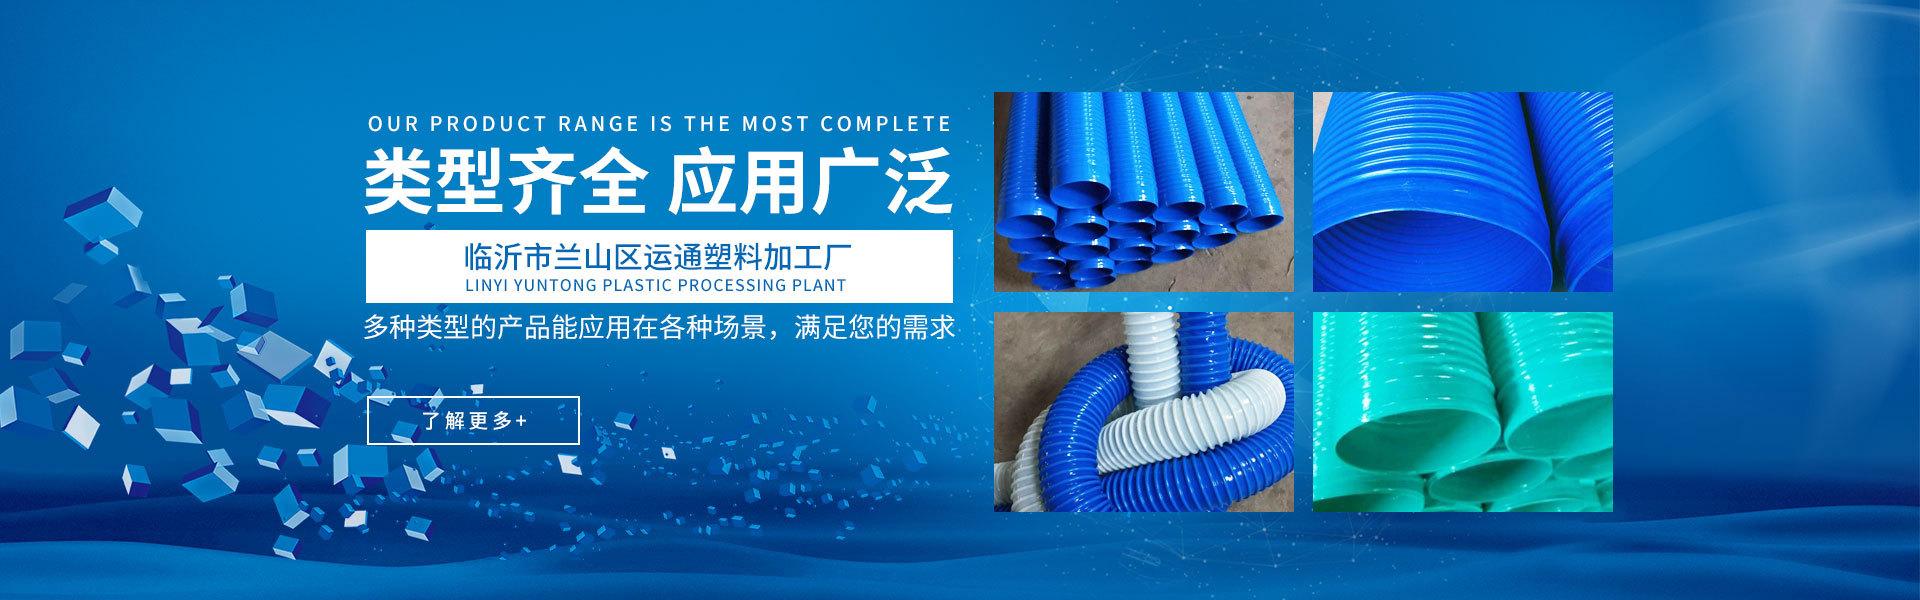 PVC通风管,PVC螺旋管,PVC除尘管厂家,吸尘软管厂家